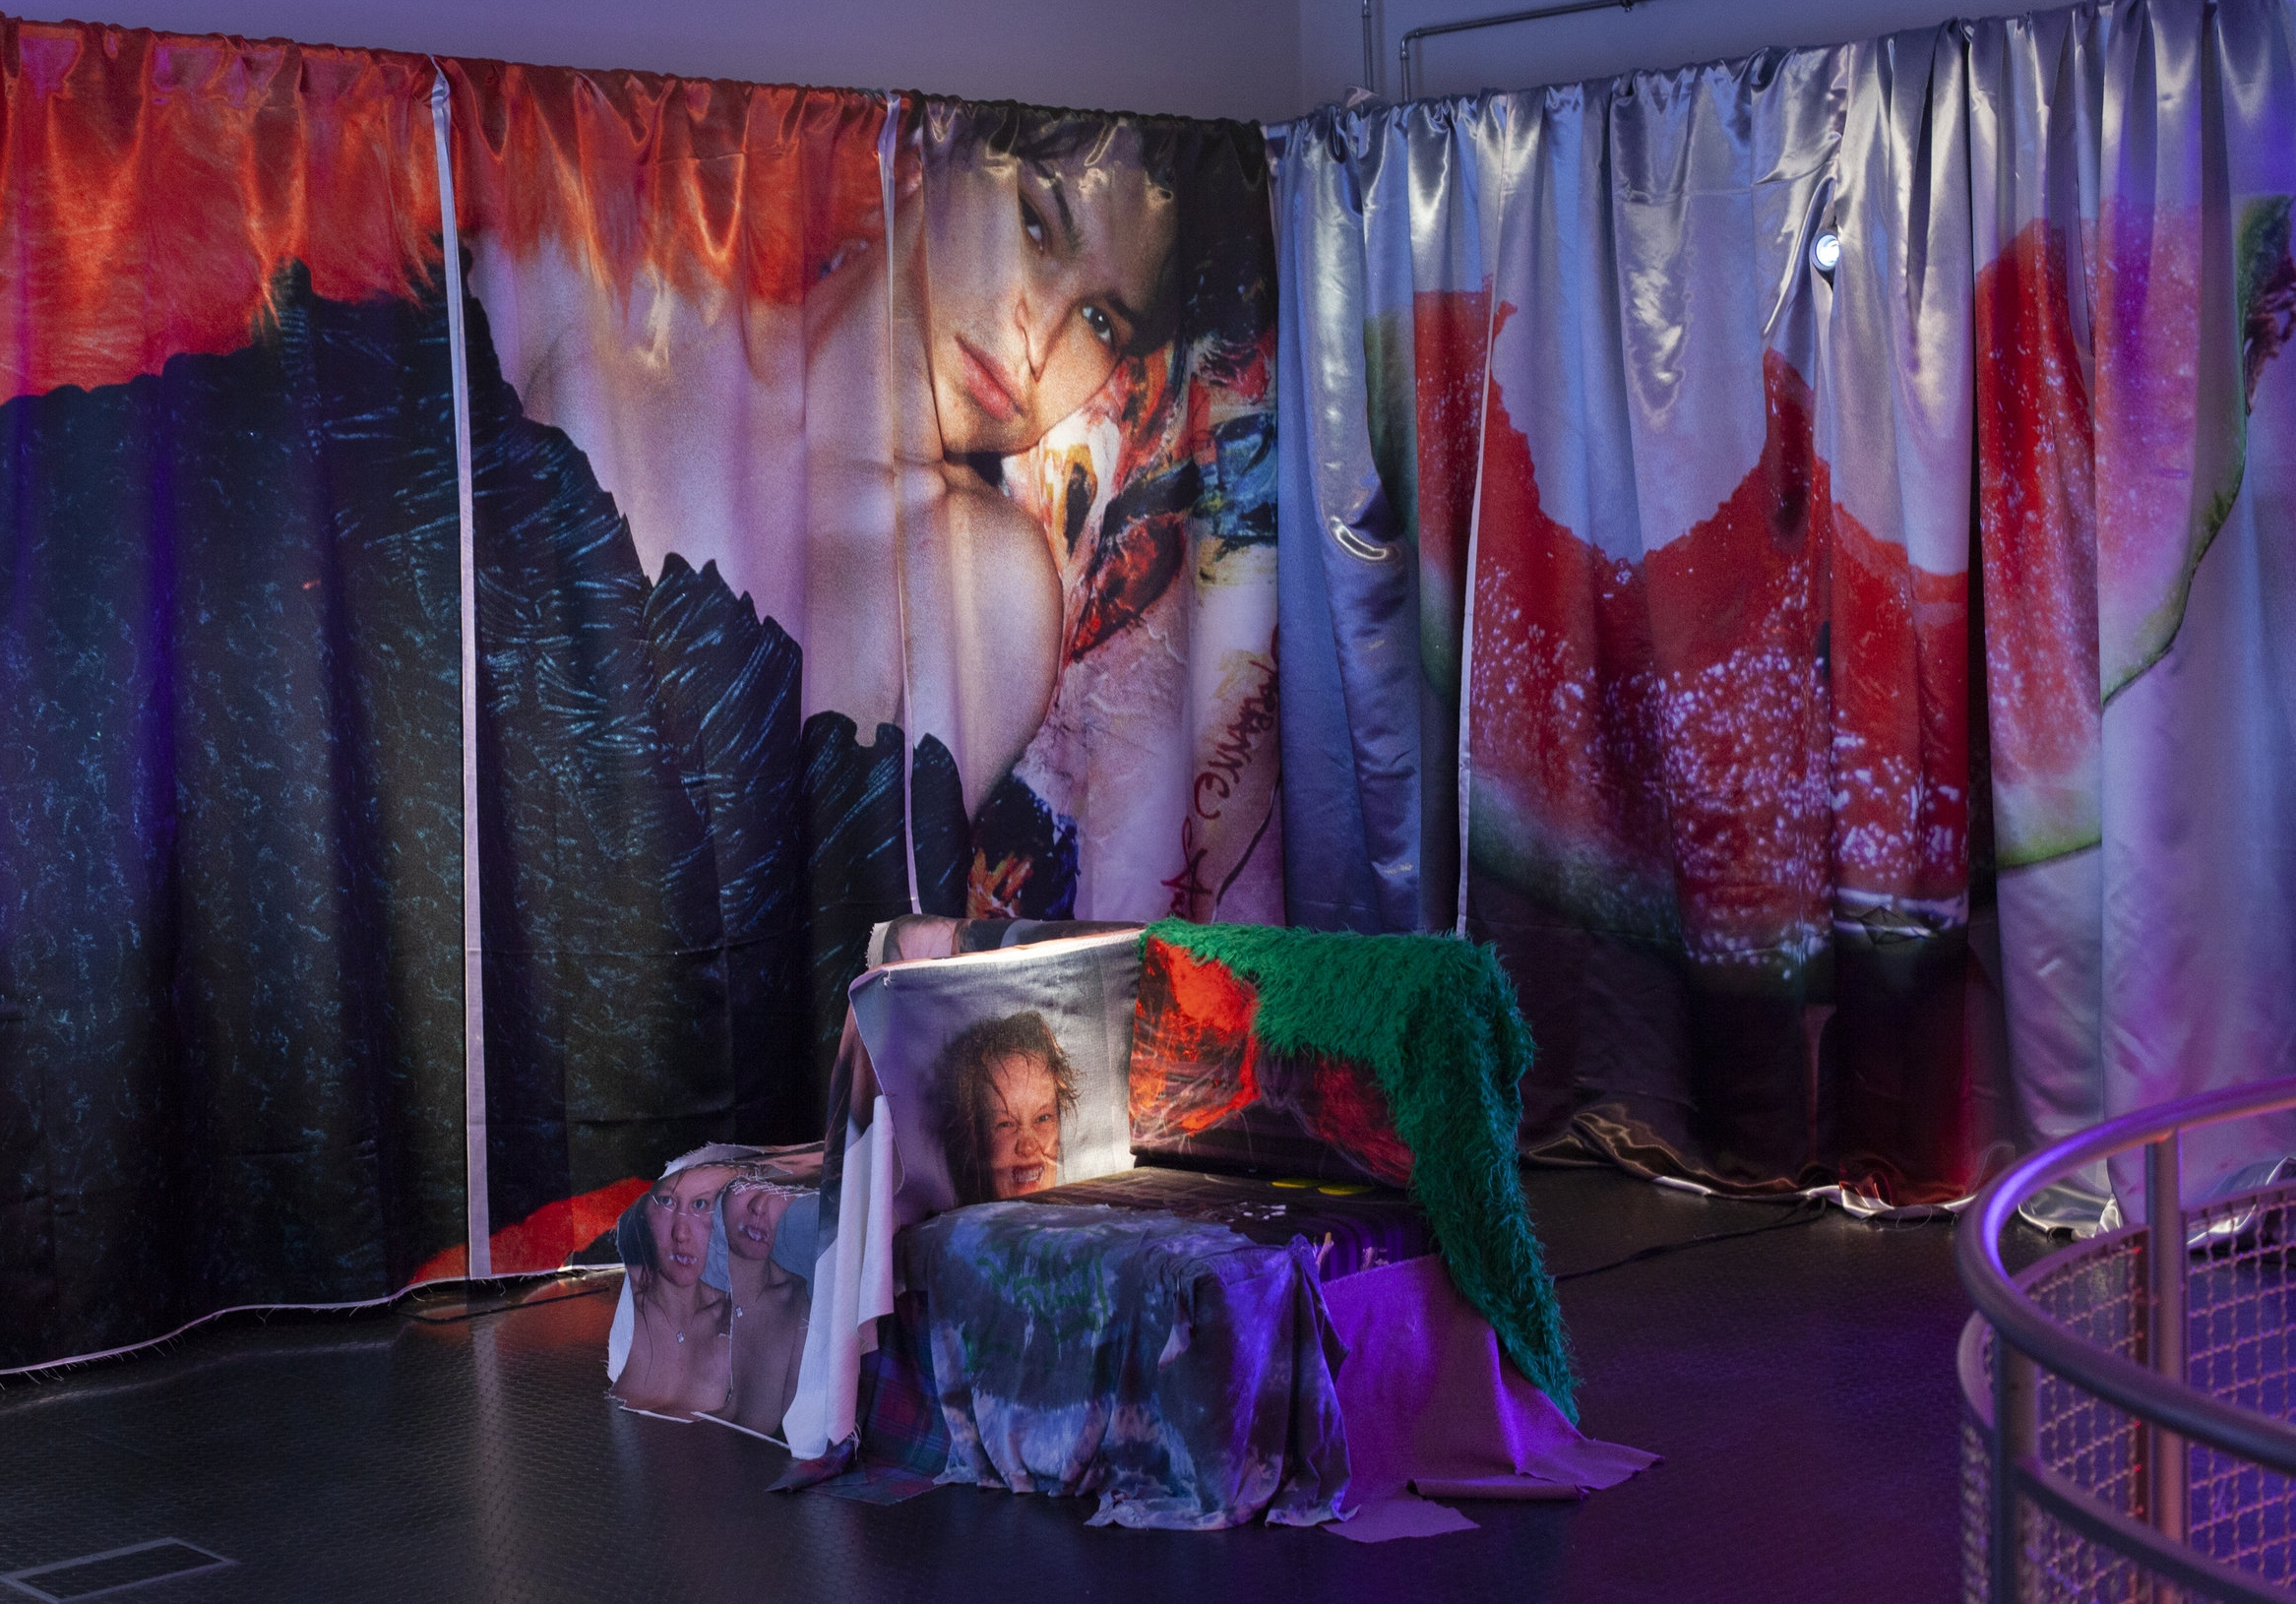 Collective_Festival_2018_Exhibitions_Maria_Pasenau_Photo_by_Sonja_Eike-1.jpg